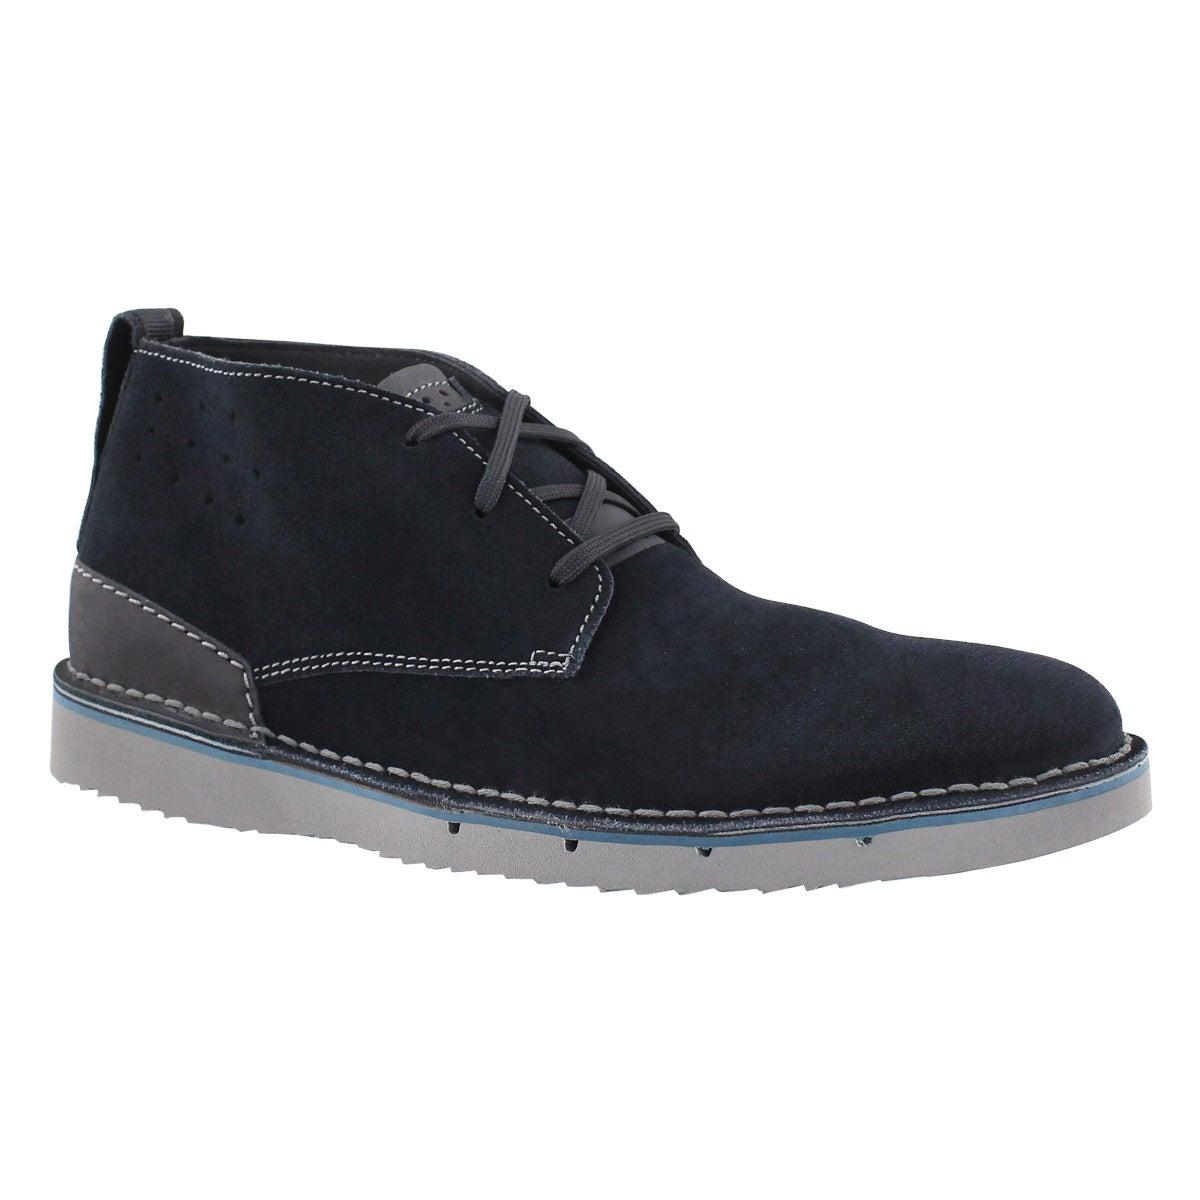 Men's CAPLER MID navy chukka boots